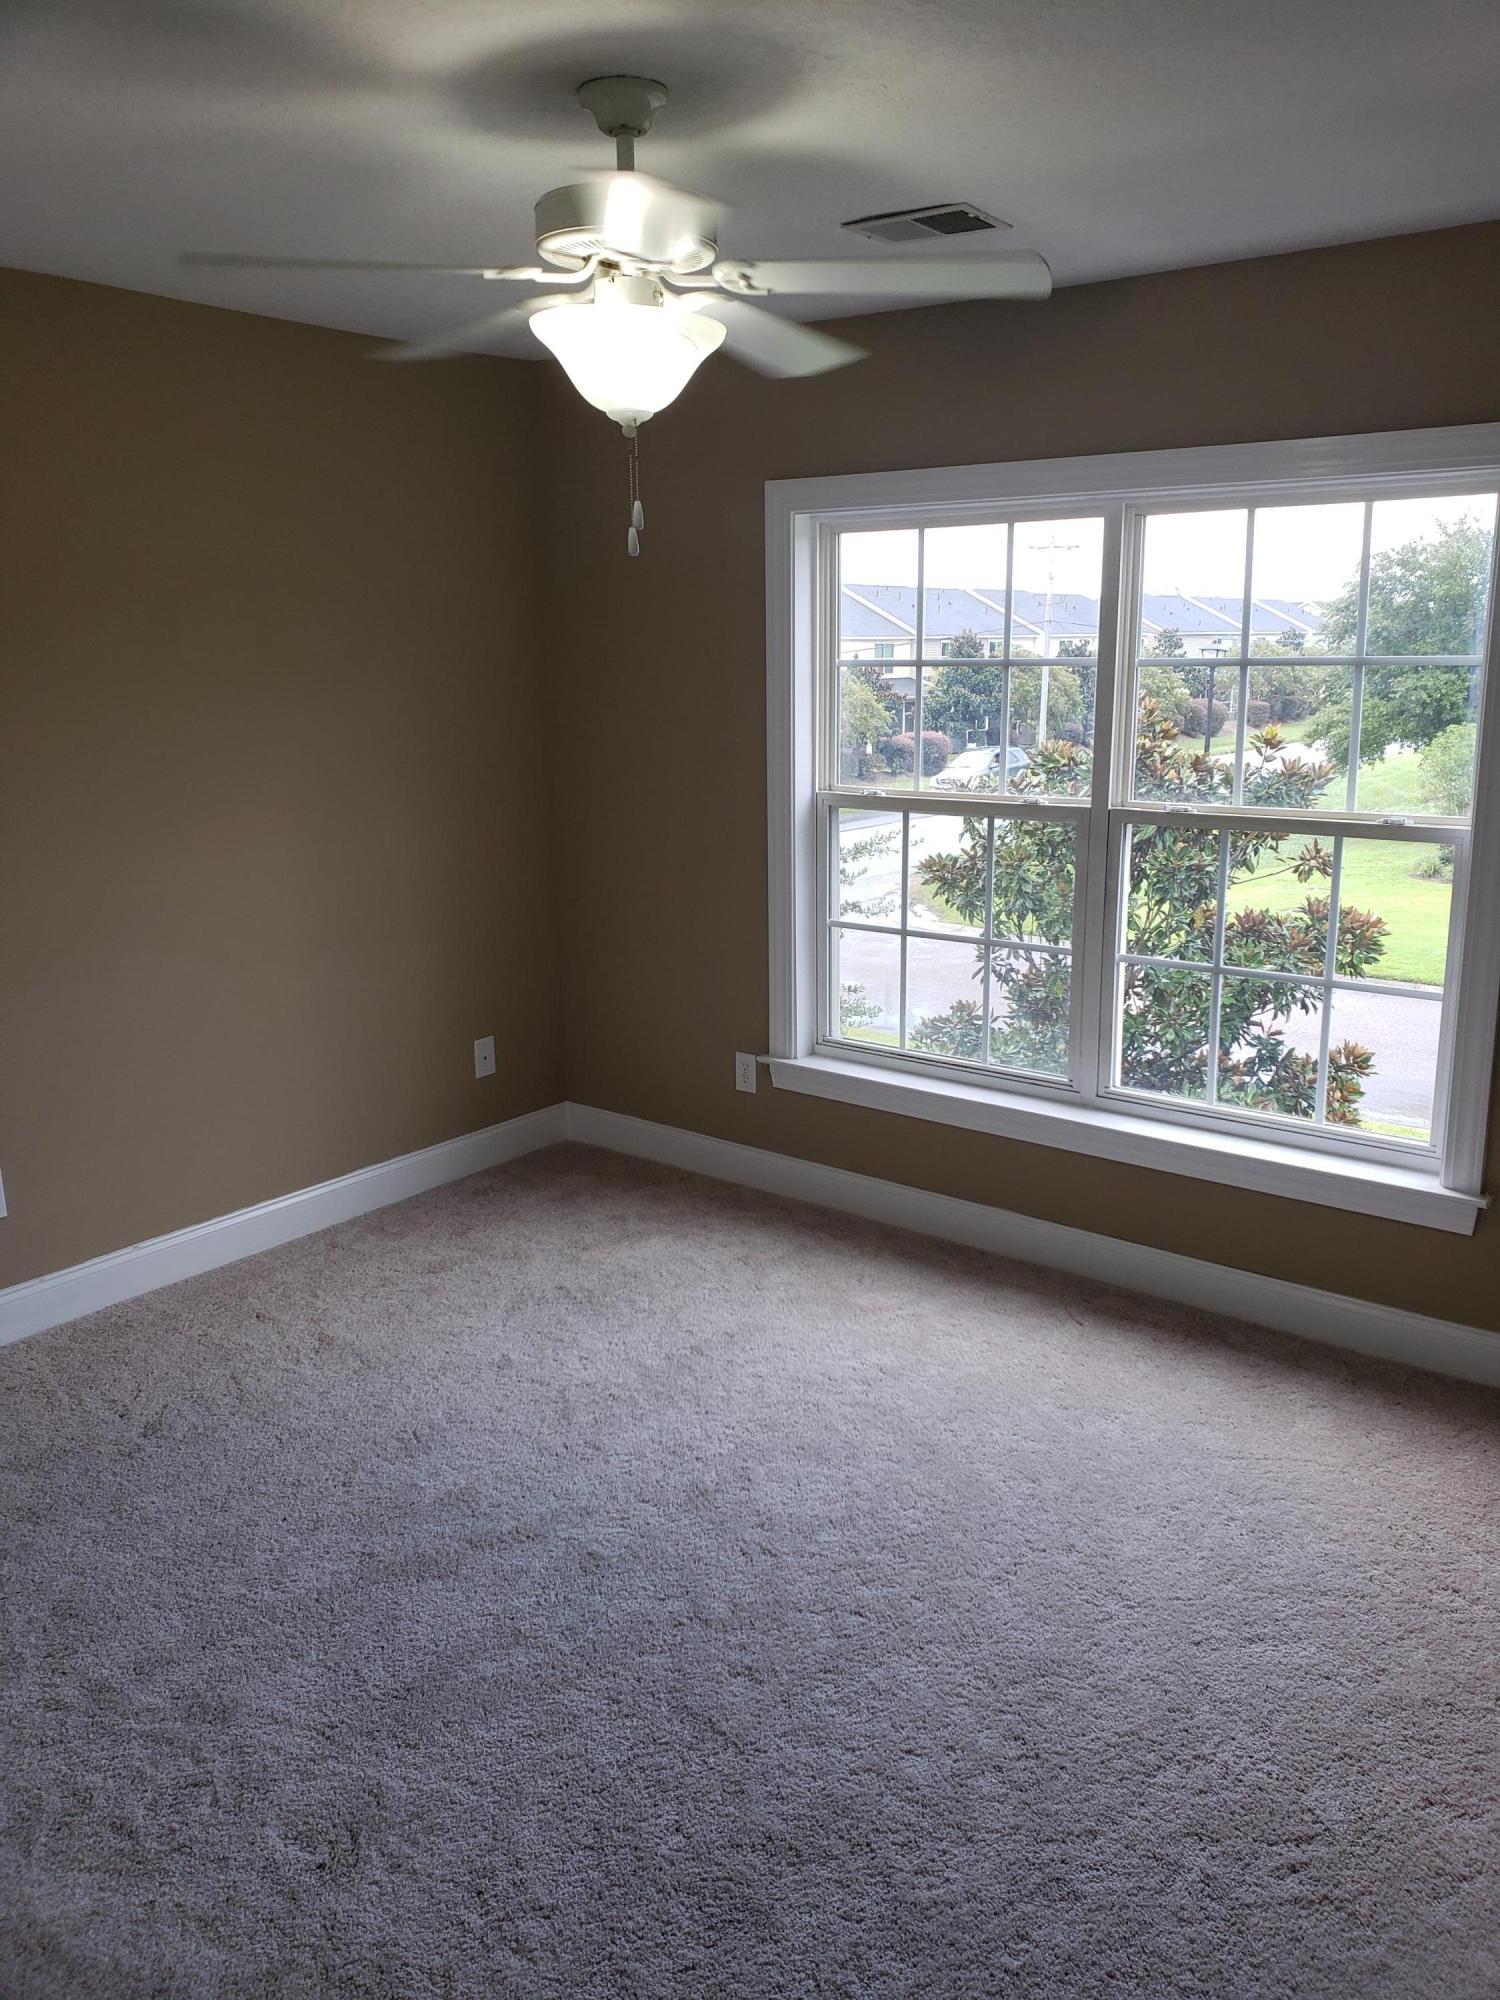 Montague Pointe Homes For Sale - 100 Gavins, Goose Creek, SC - 7